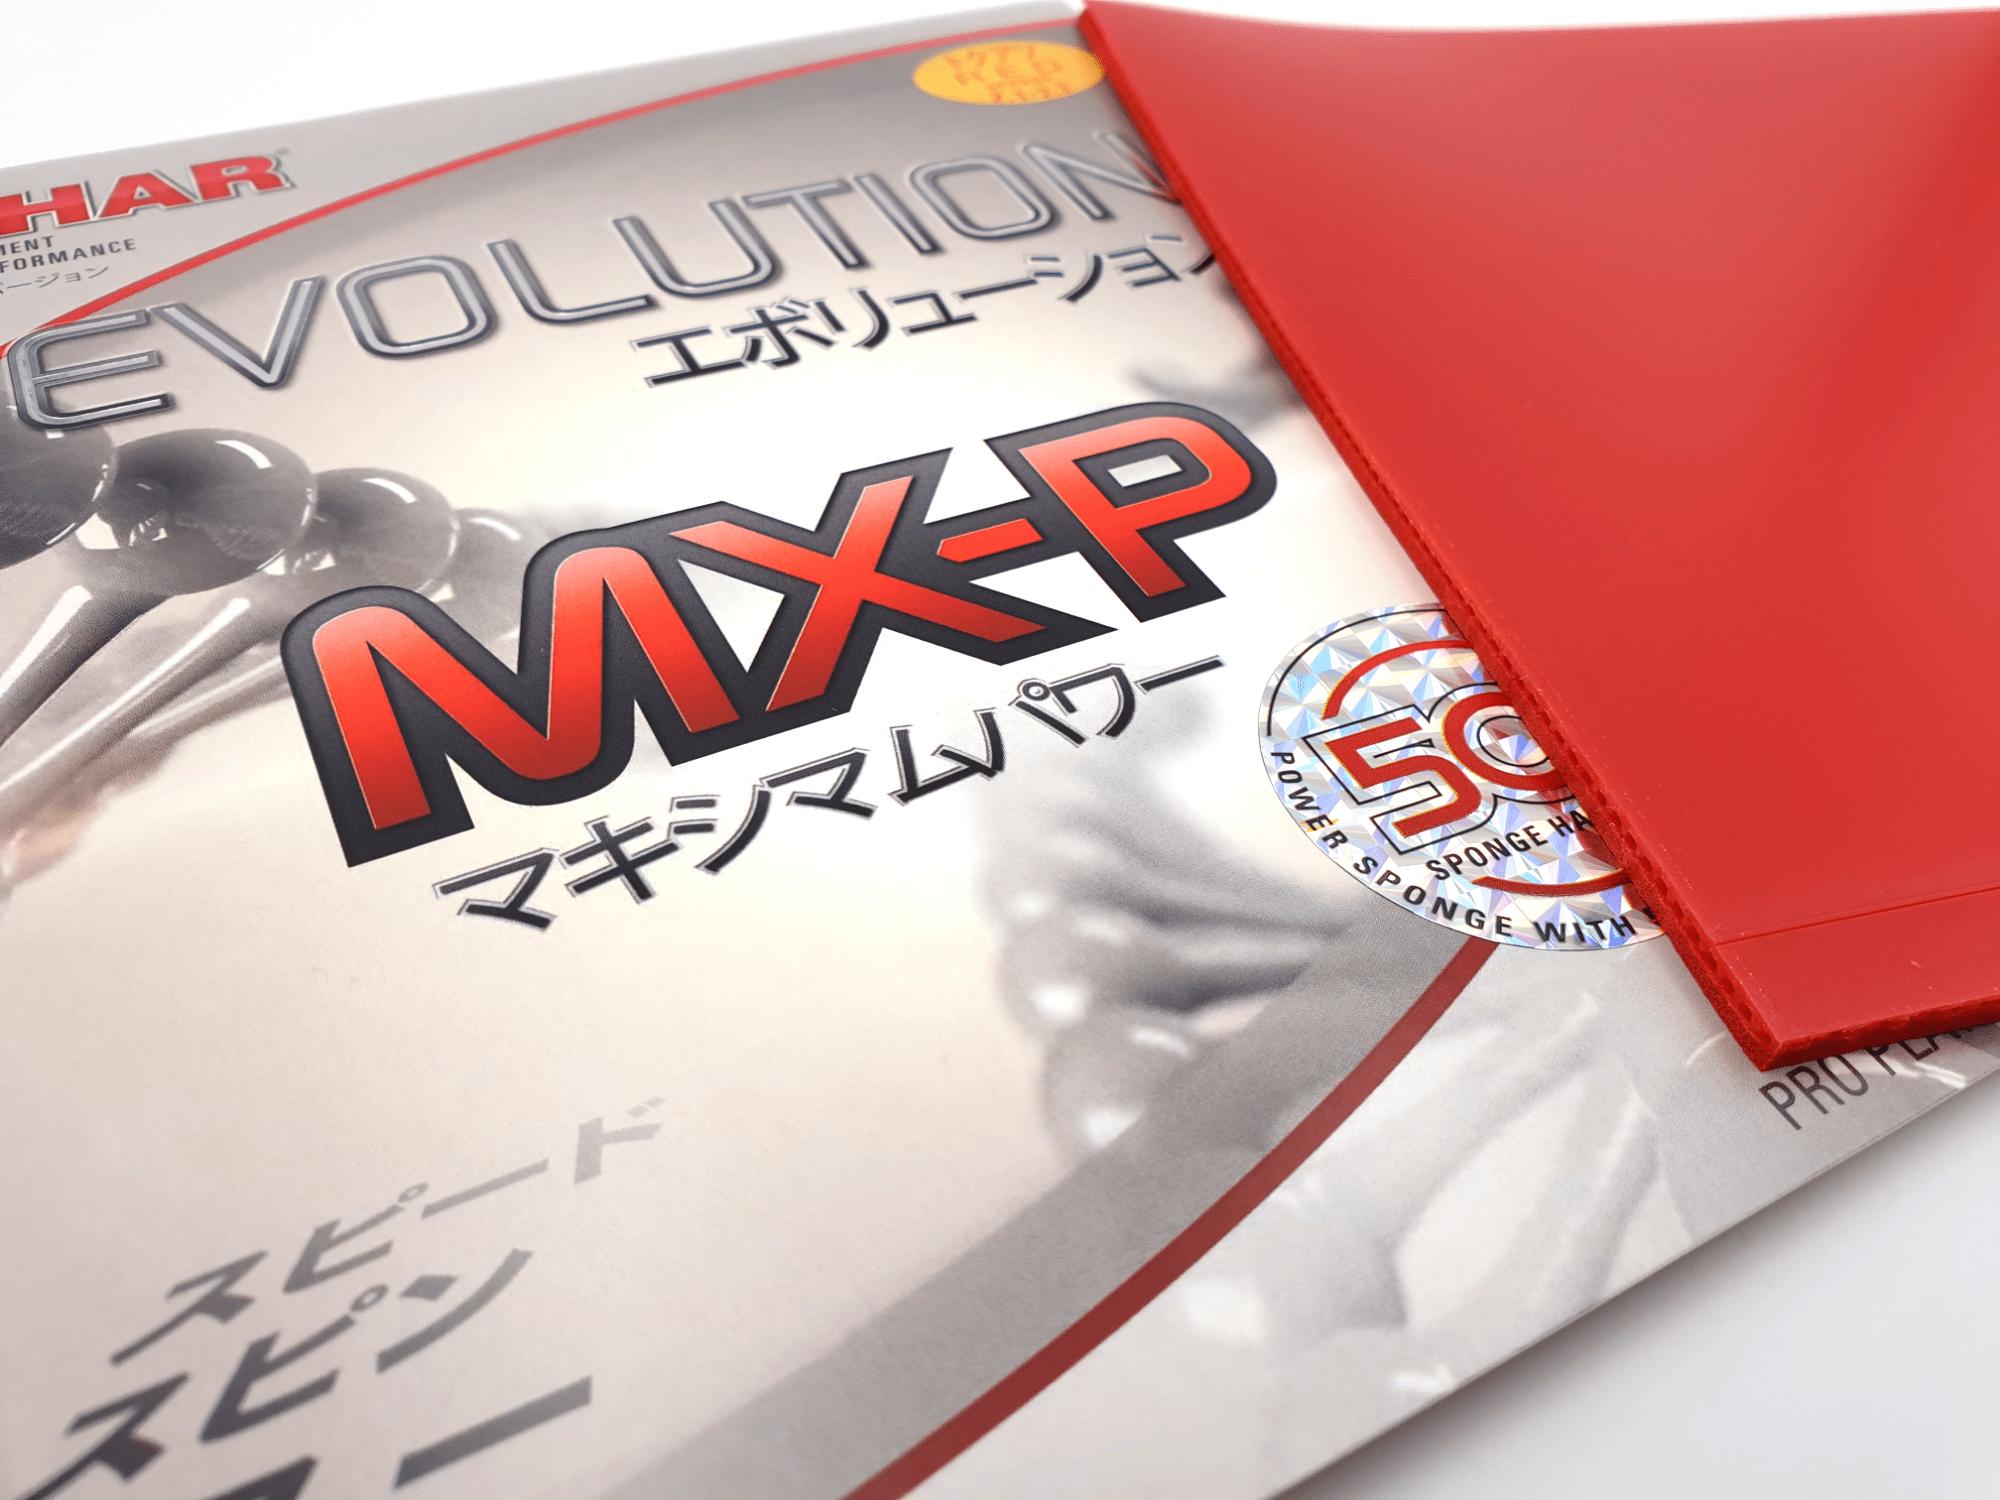 Evolution MX-P